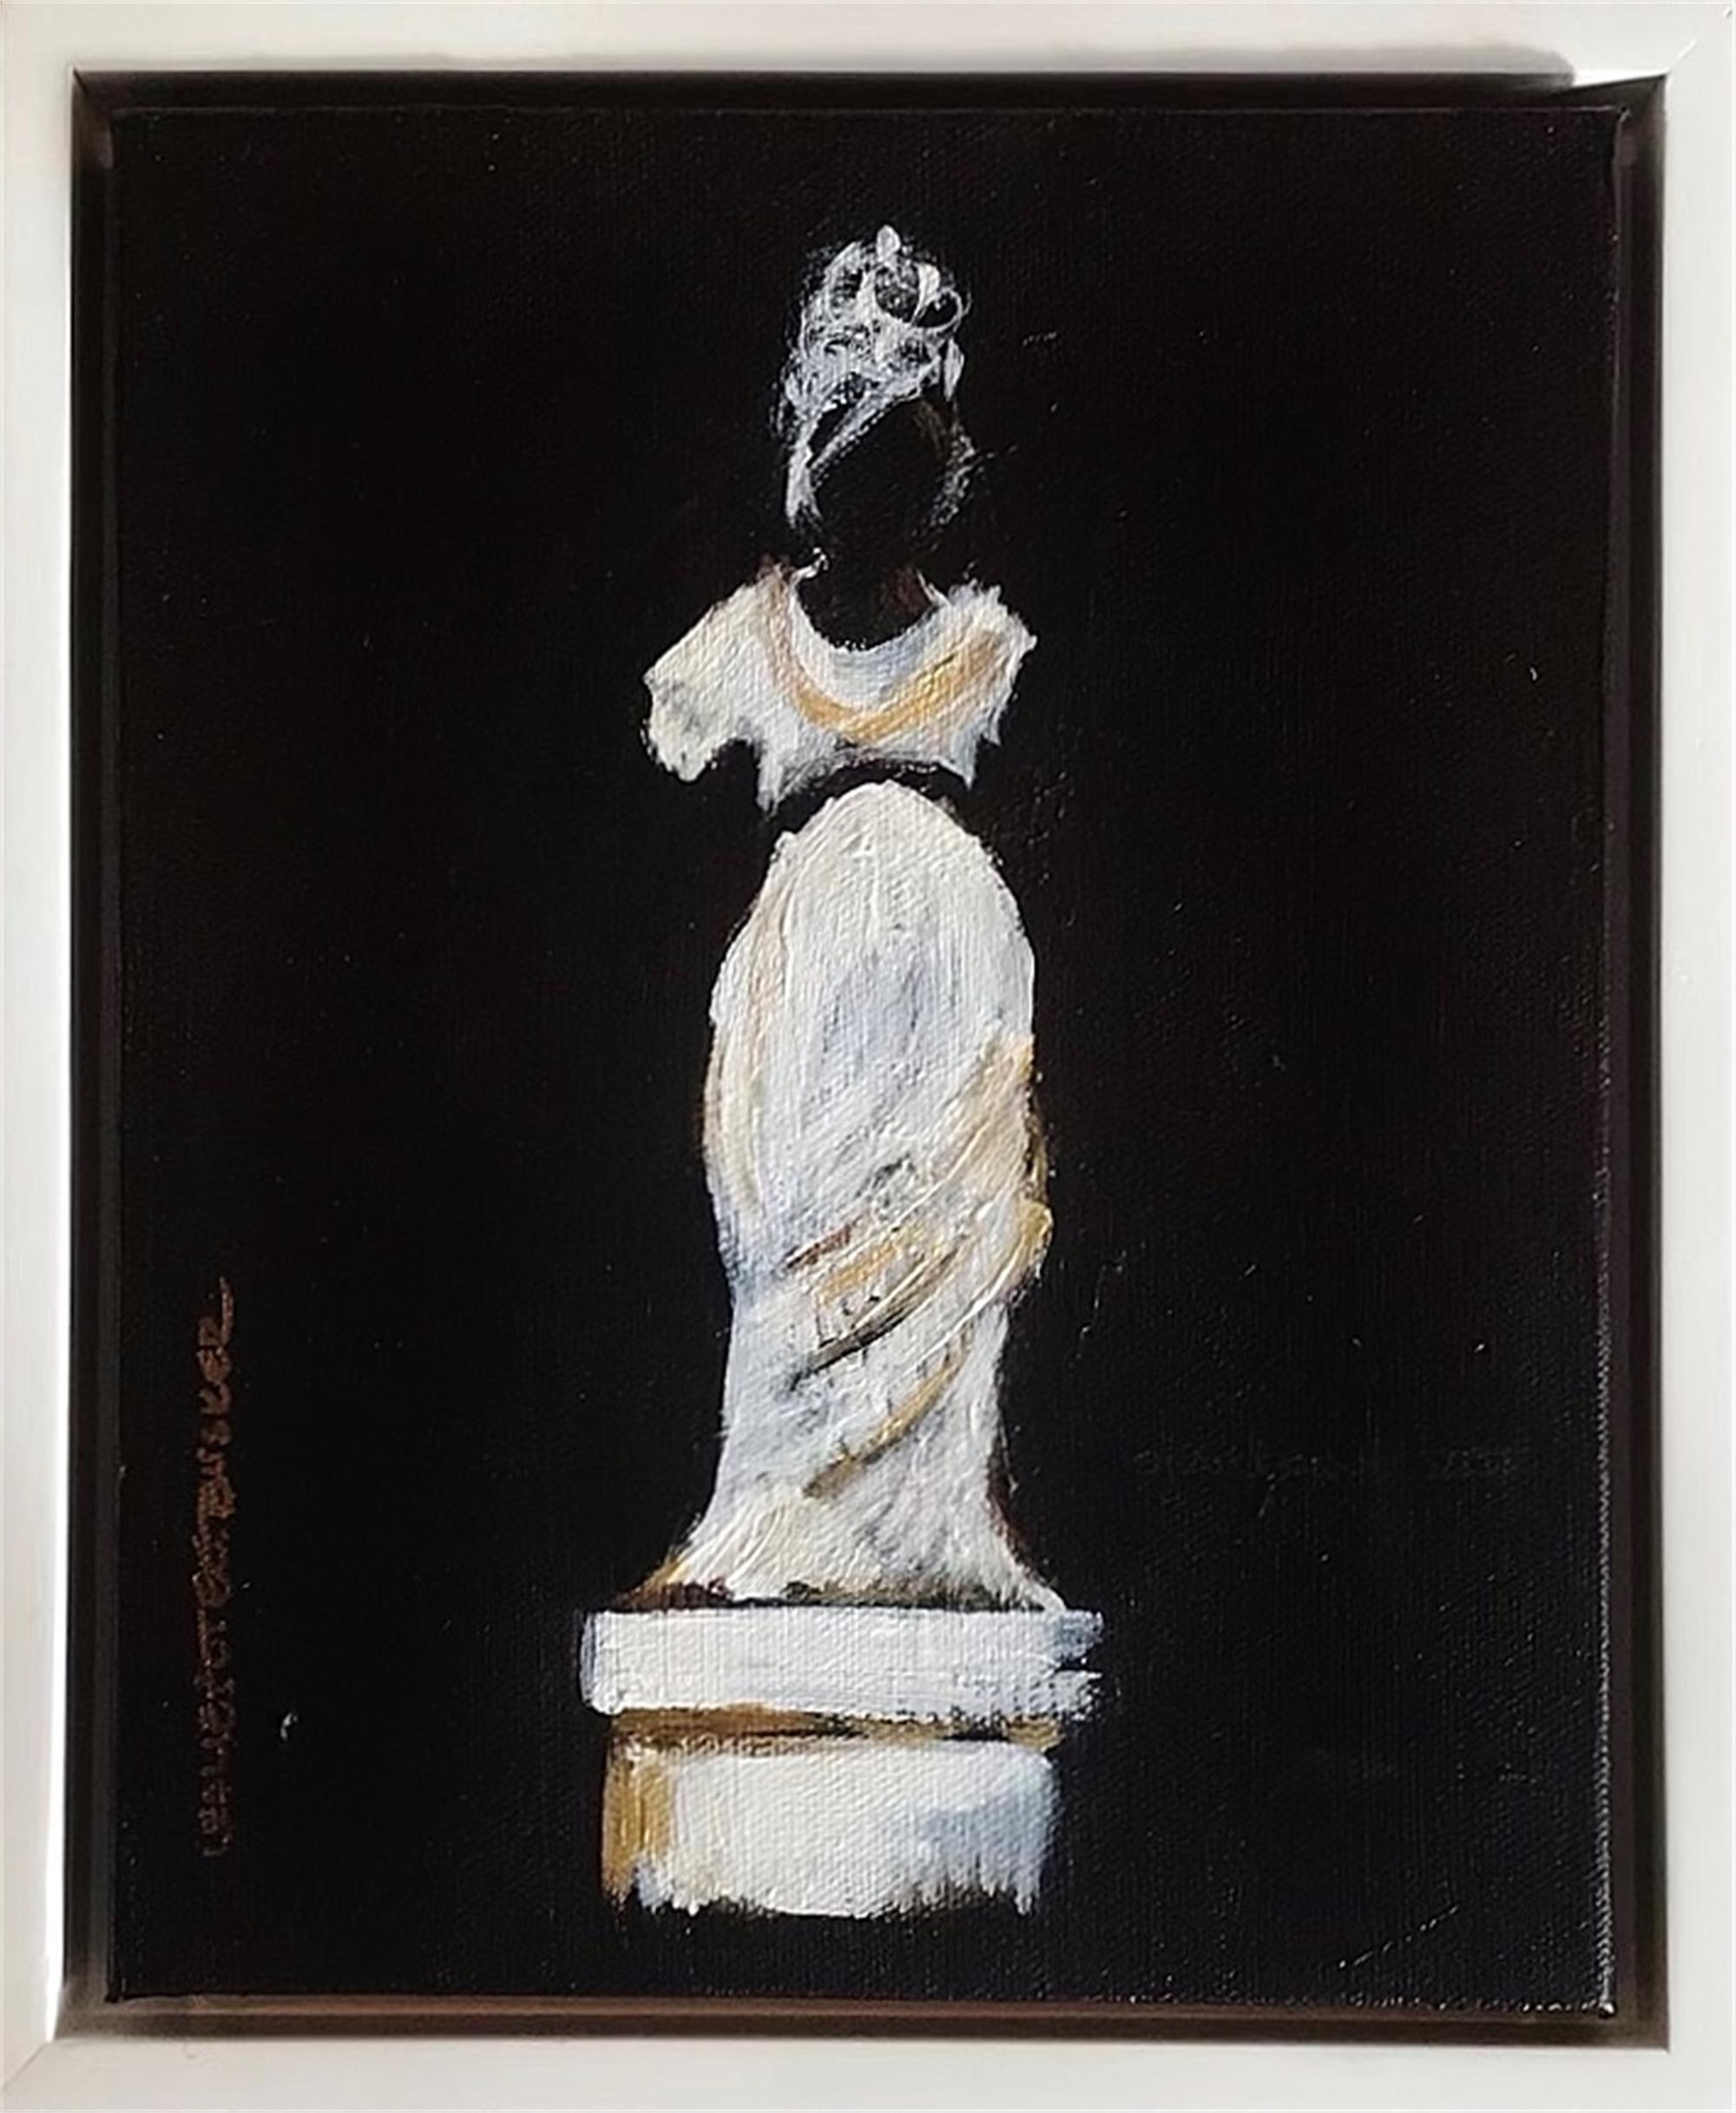 Statuesque VIII by Leslie Poteet Busker